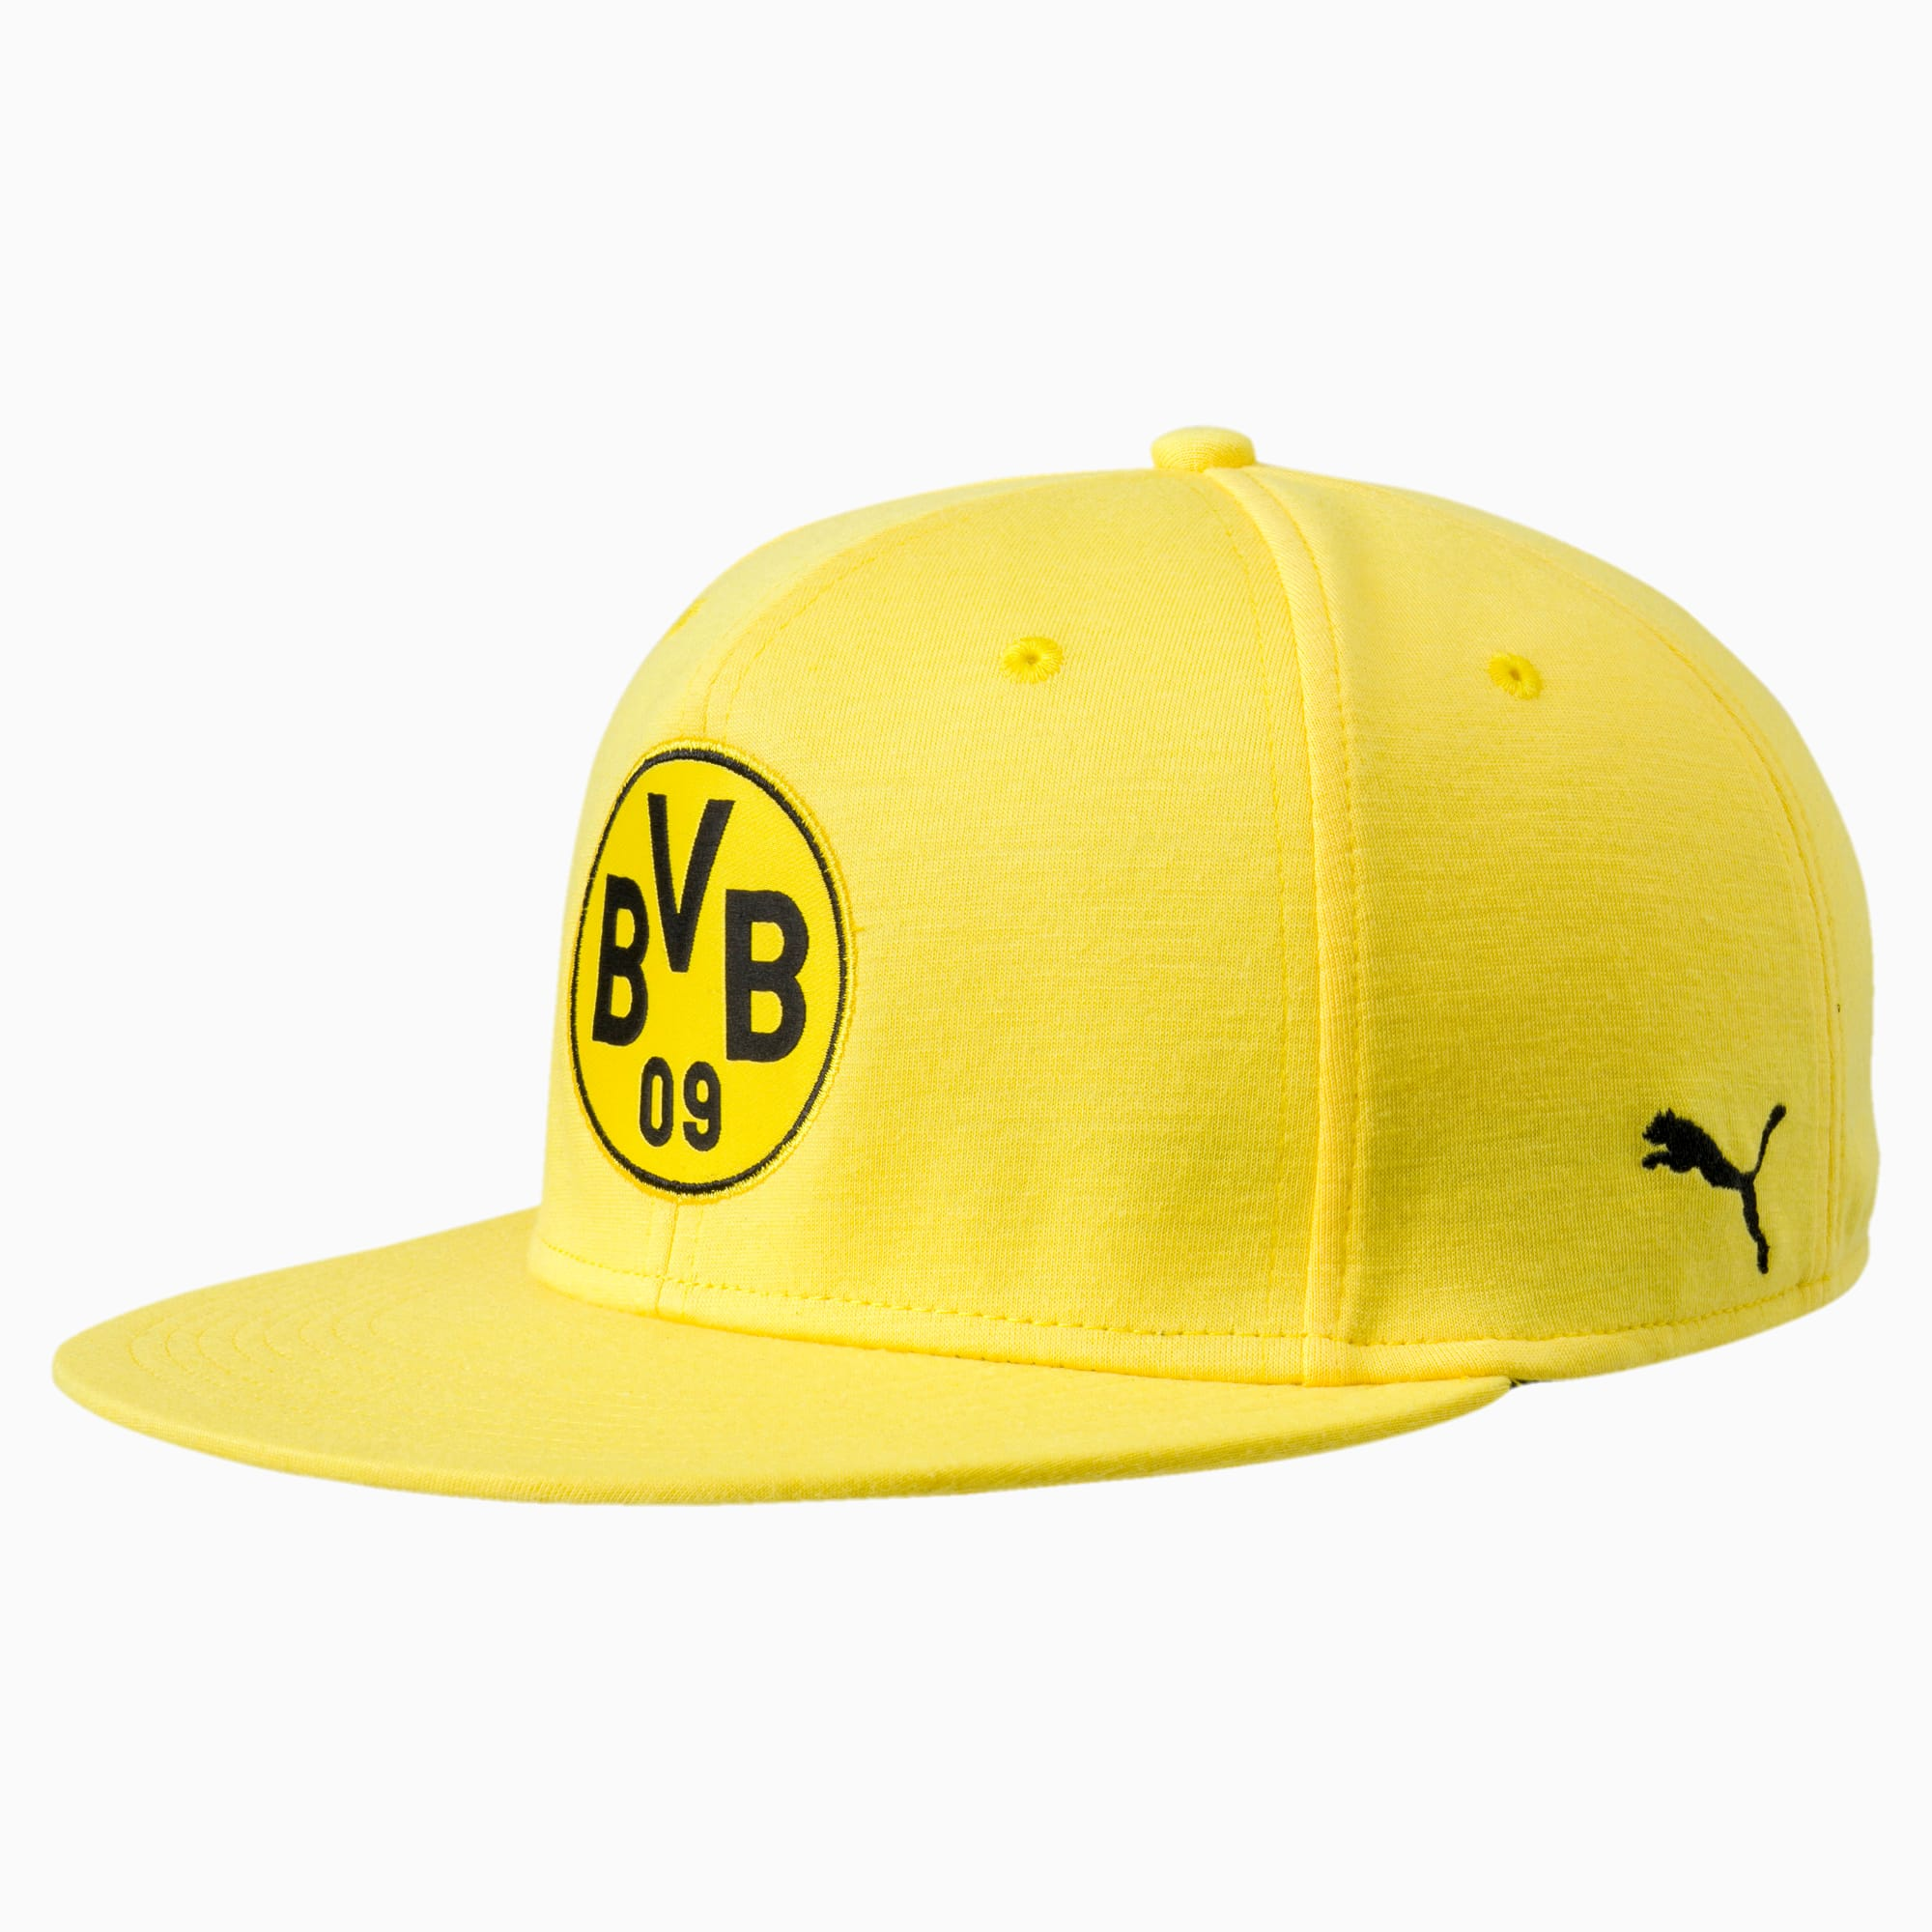 Borussia Dortmund Stretch Fit Logo Hat Puma Us